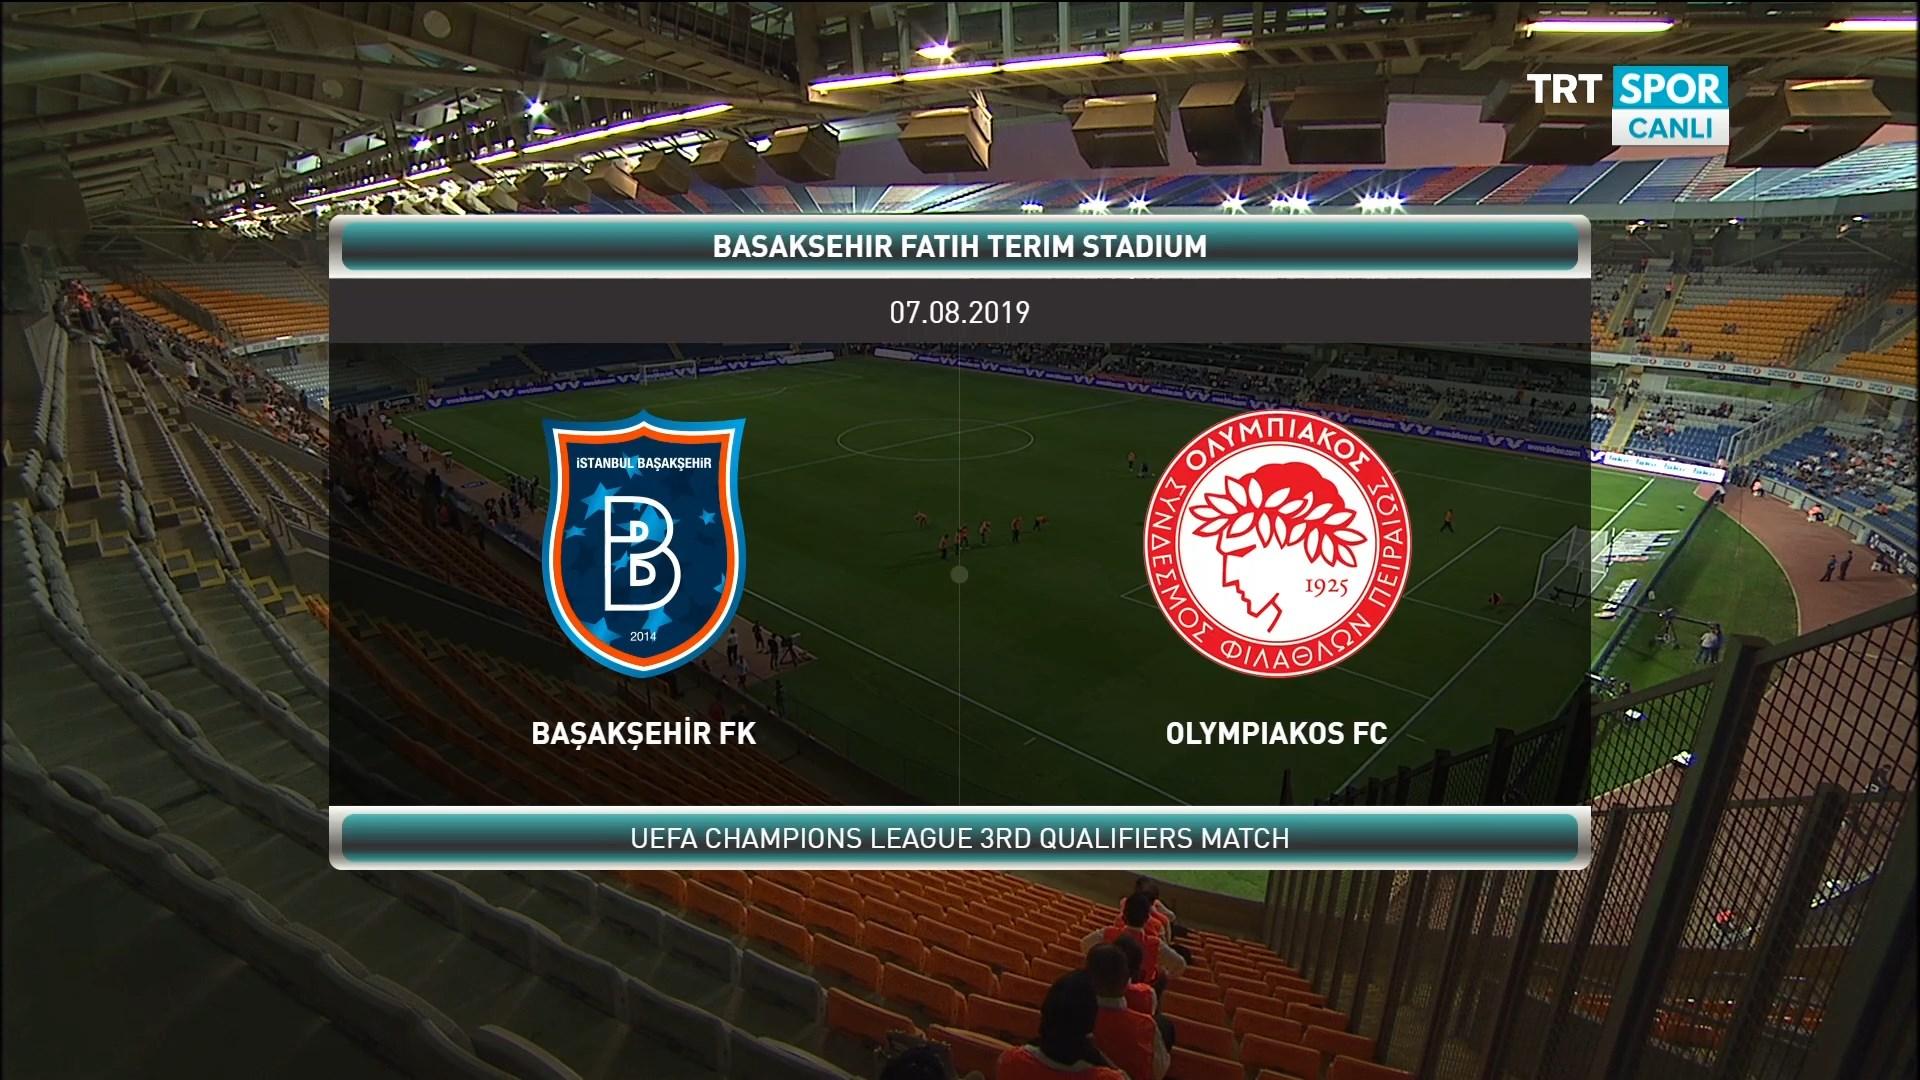 Photo of Prediksi Liga Champion 2019 Olympiakos vs Istanbul Basaksehir 14 Agustus